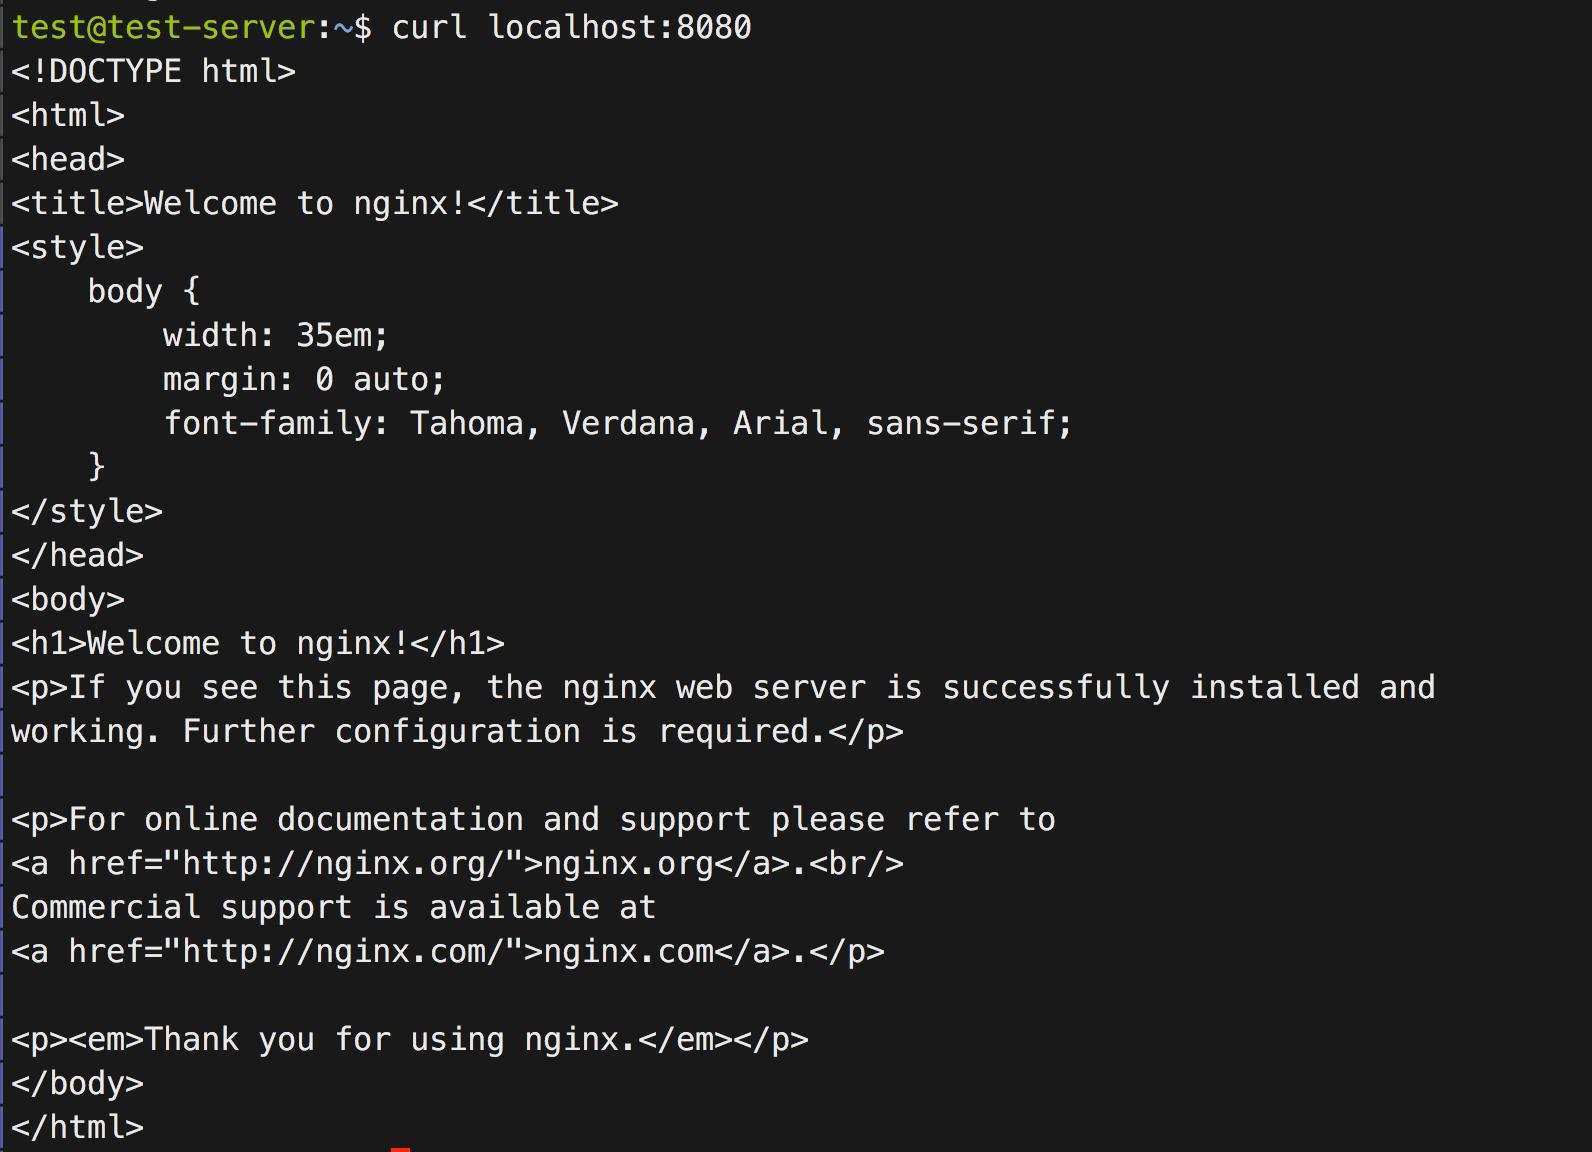 http://server.digimetriq.com/wp-content/uploads/2021/01/1610911798_545_Running-a-single-node-Kubernetes-cluster-using-Minikube-on-Ubuntu.png